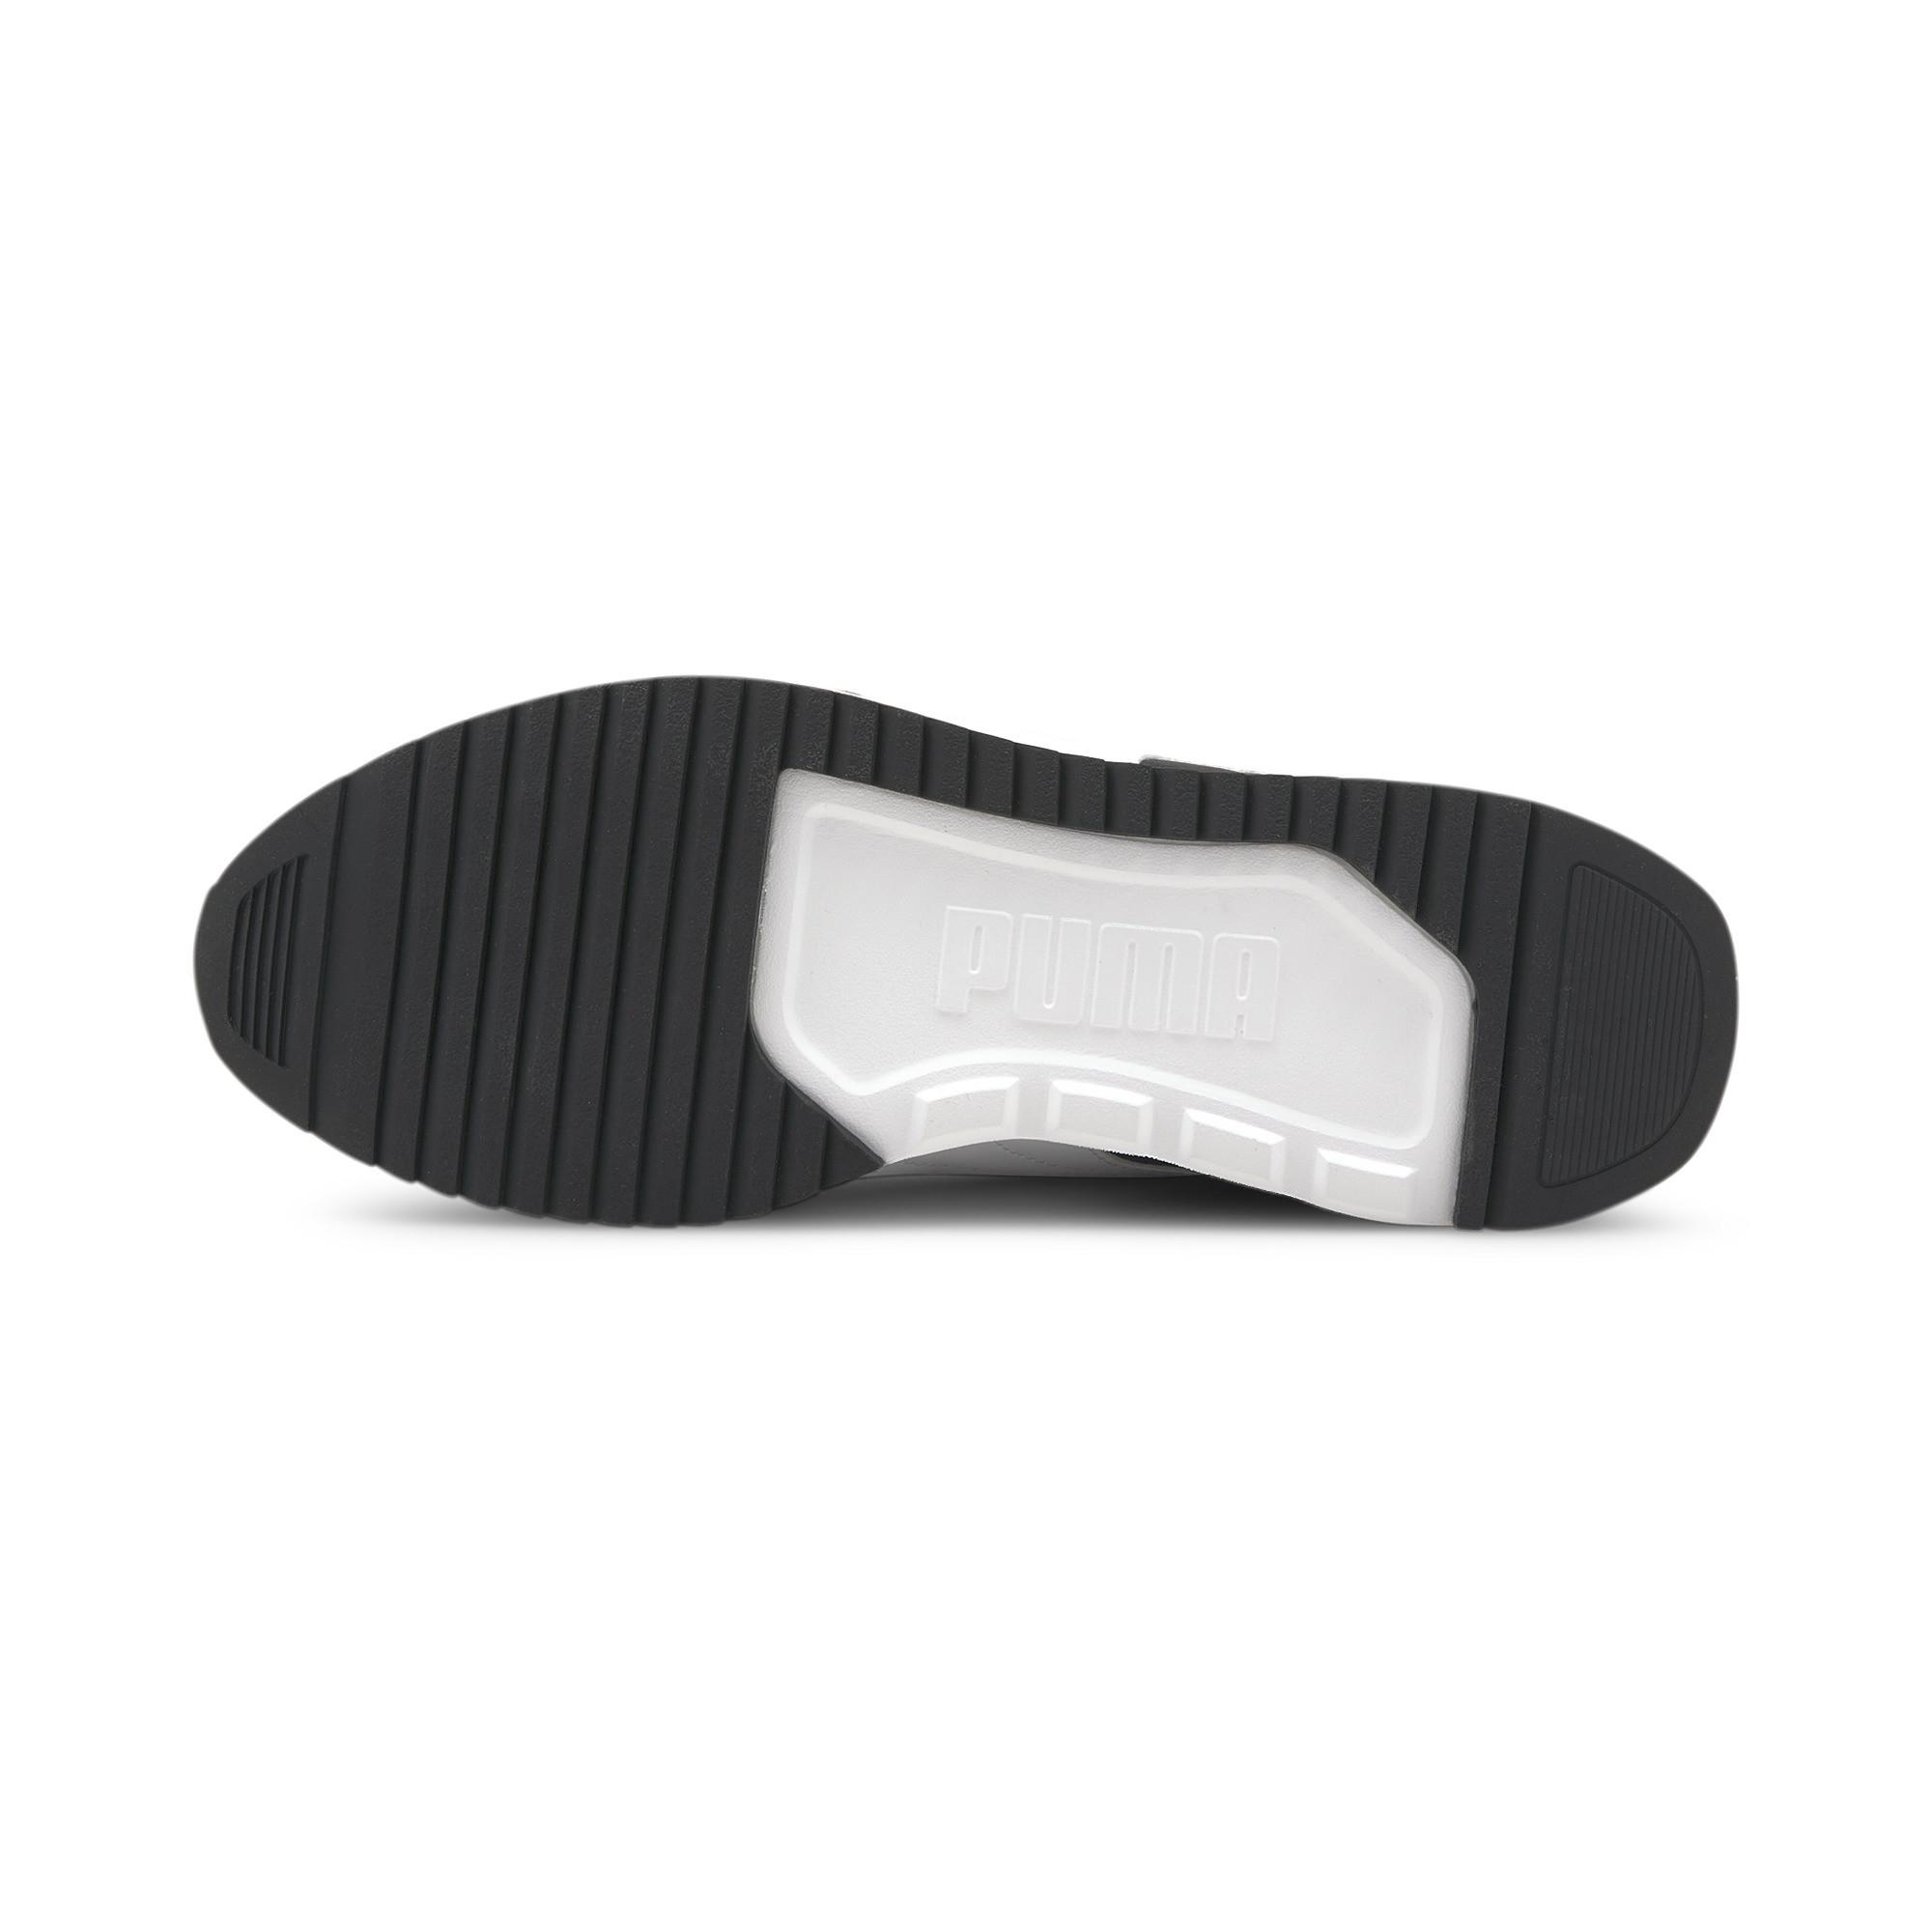 thumbnail 12 - PUMA Men's R78 Sneakers